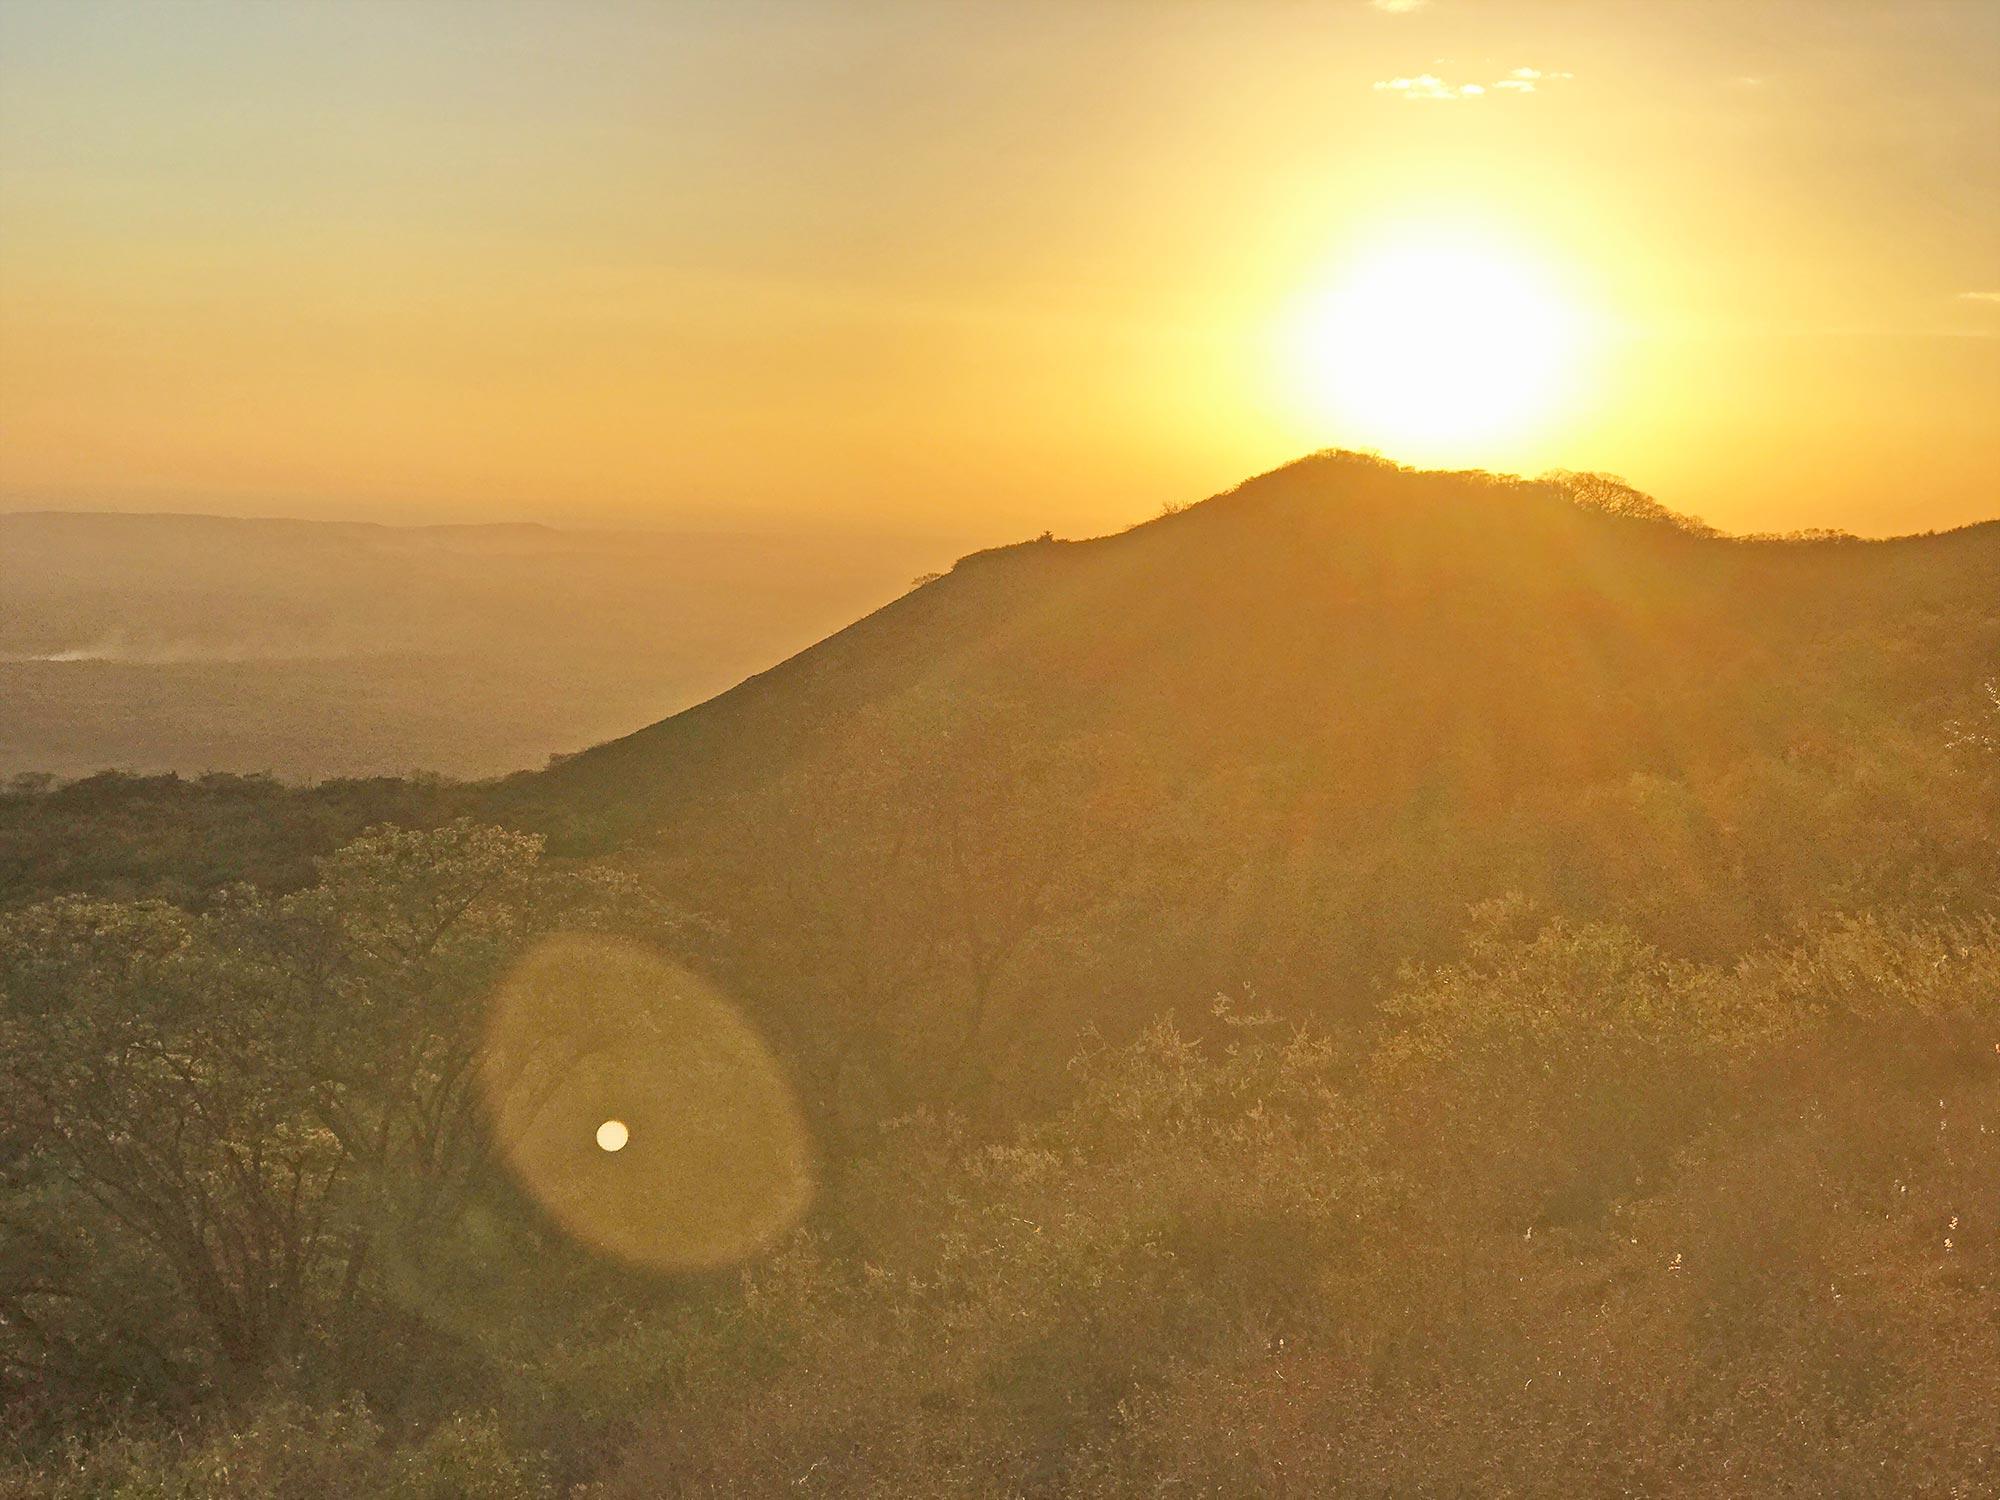 sunset while hiking El Hoyo volcano in Nicaragua